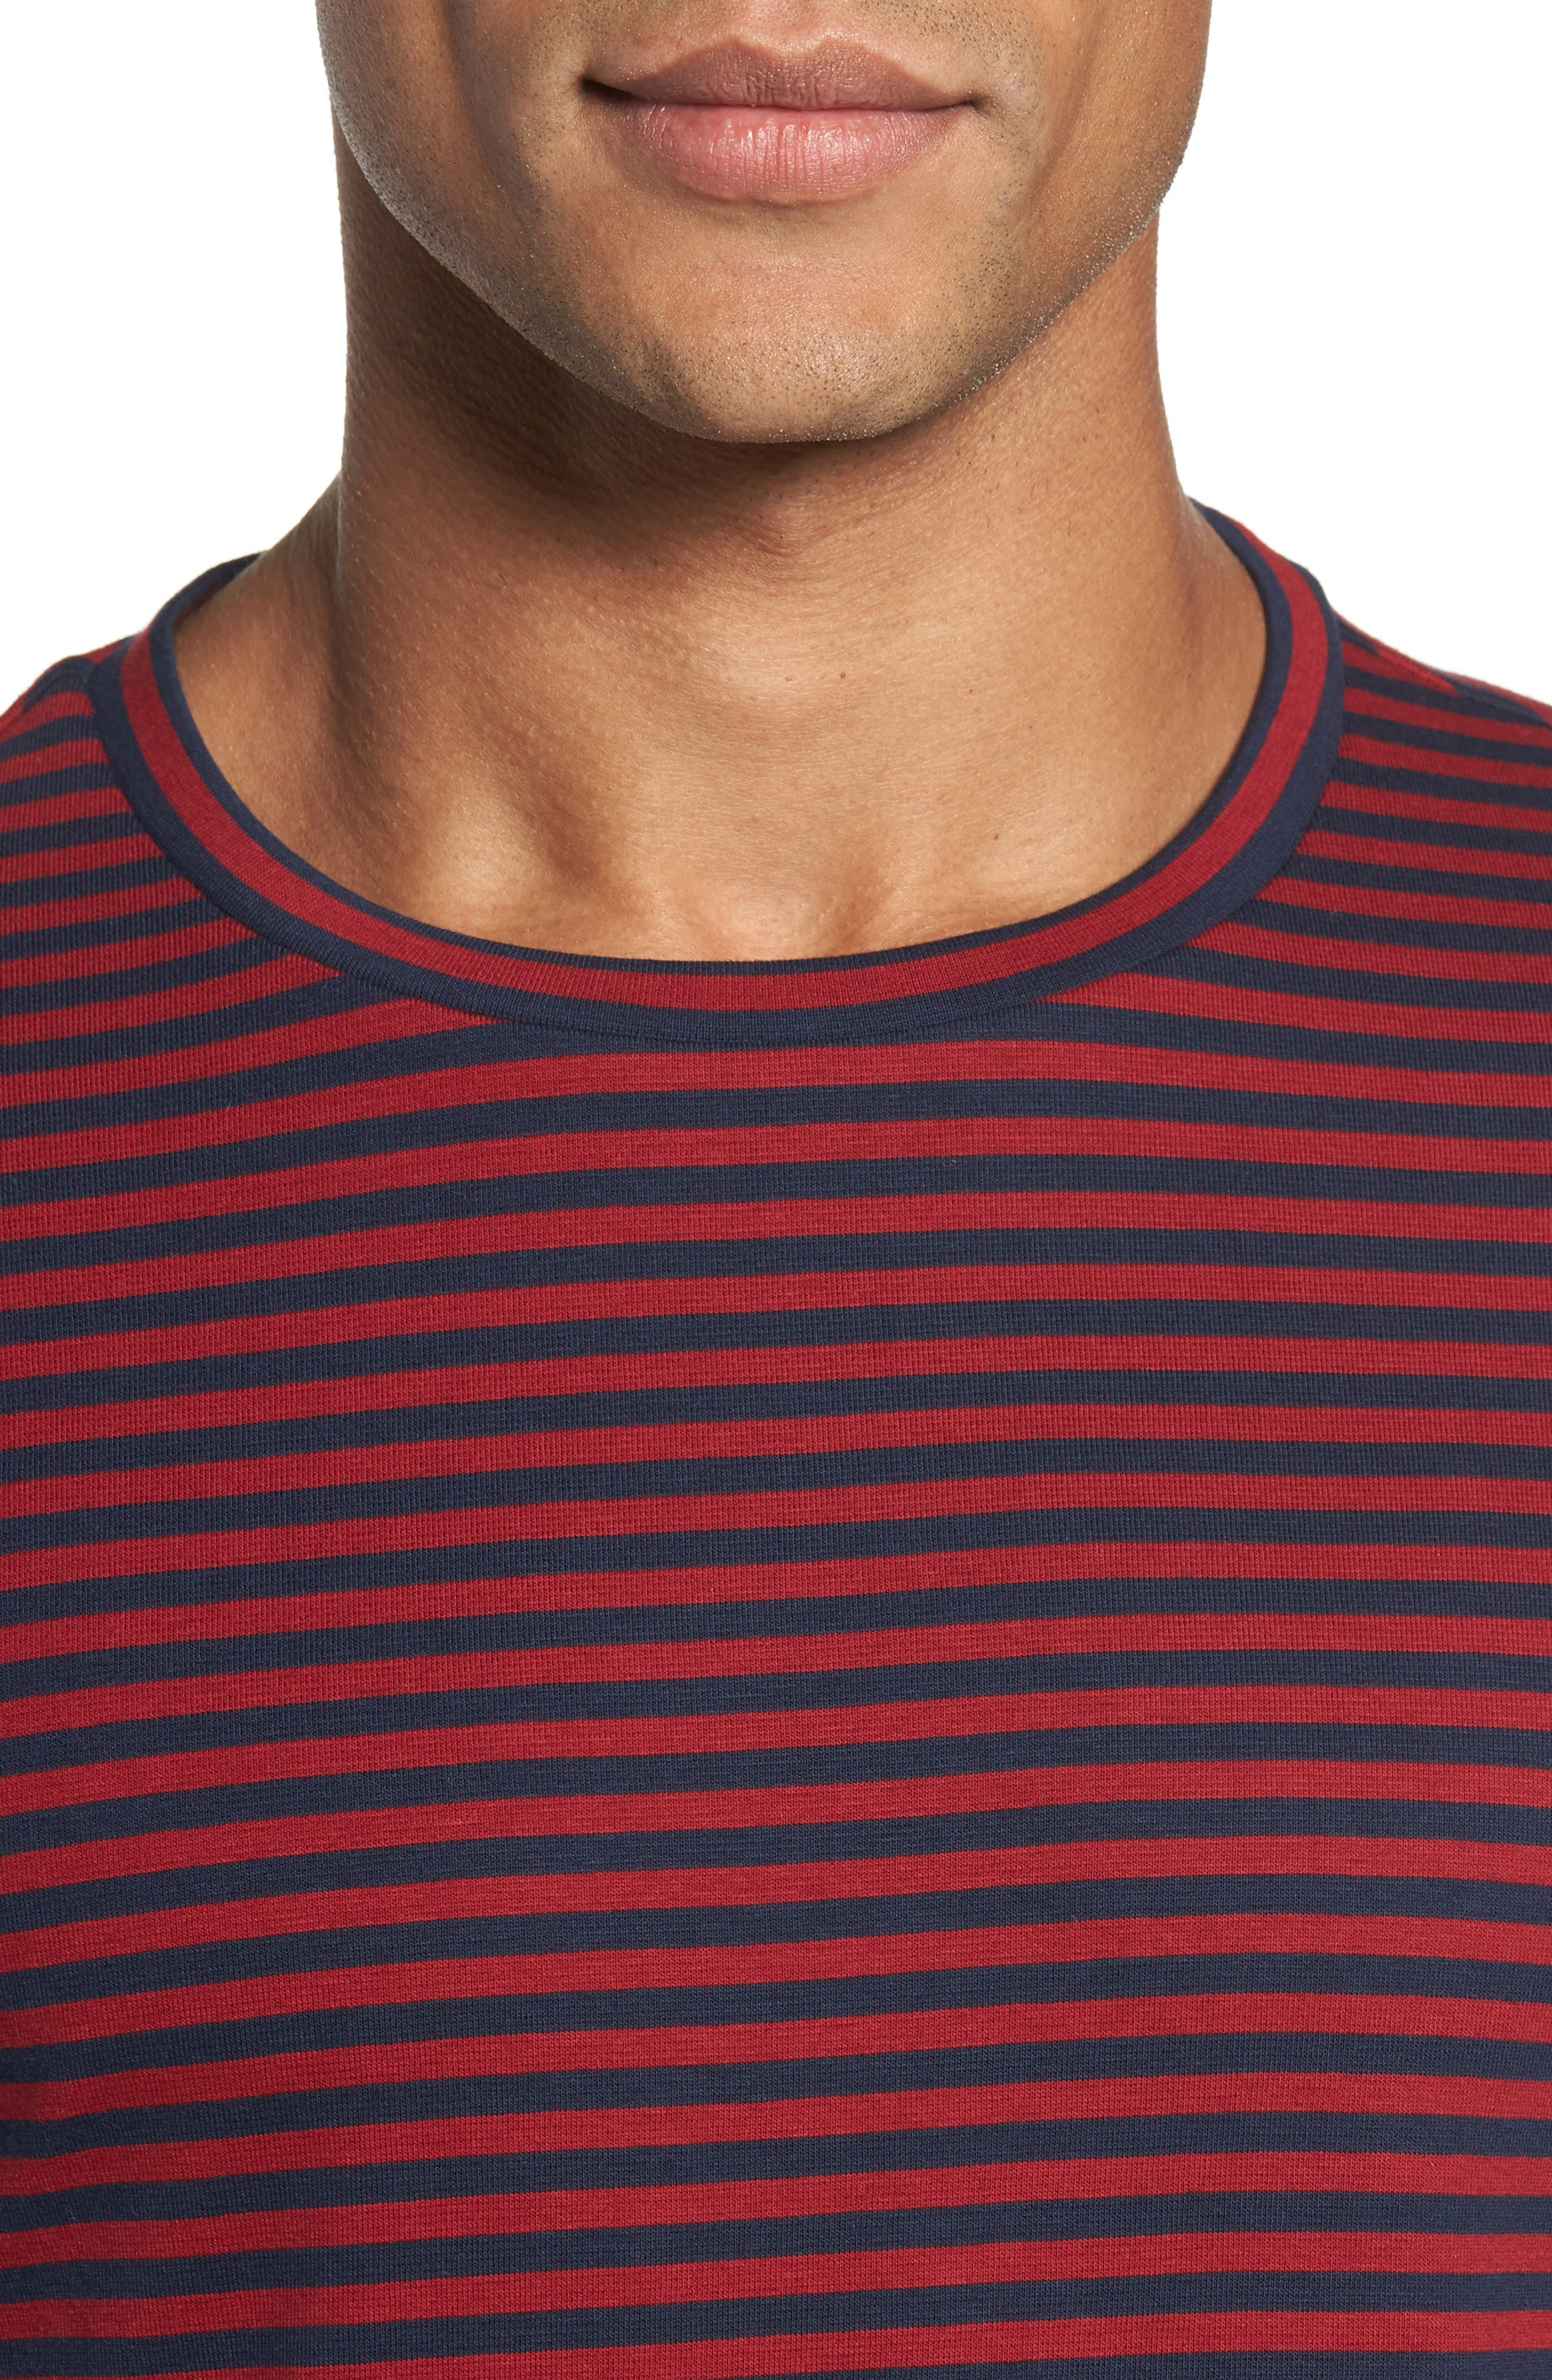 Stripe Long Sleeve T-Shirt,                             Alternate thumbnail 4, color,                             611